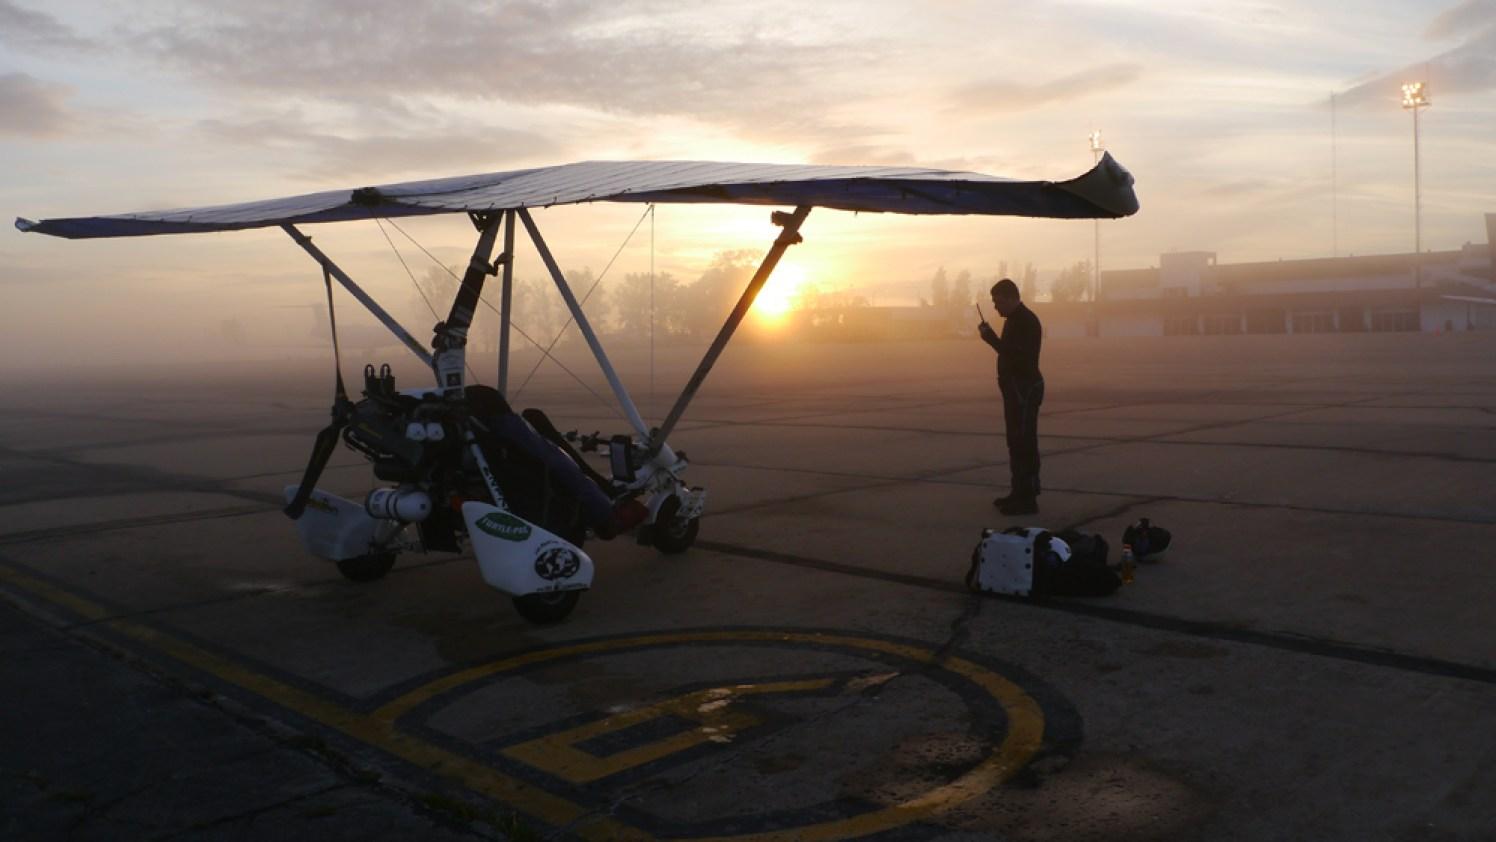 Worldtrike Weltreise mit Flugzeug Panamericana